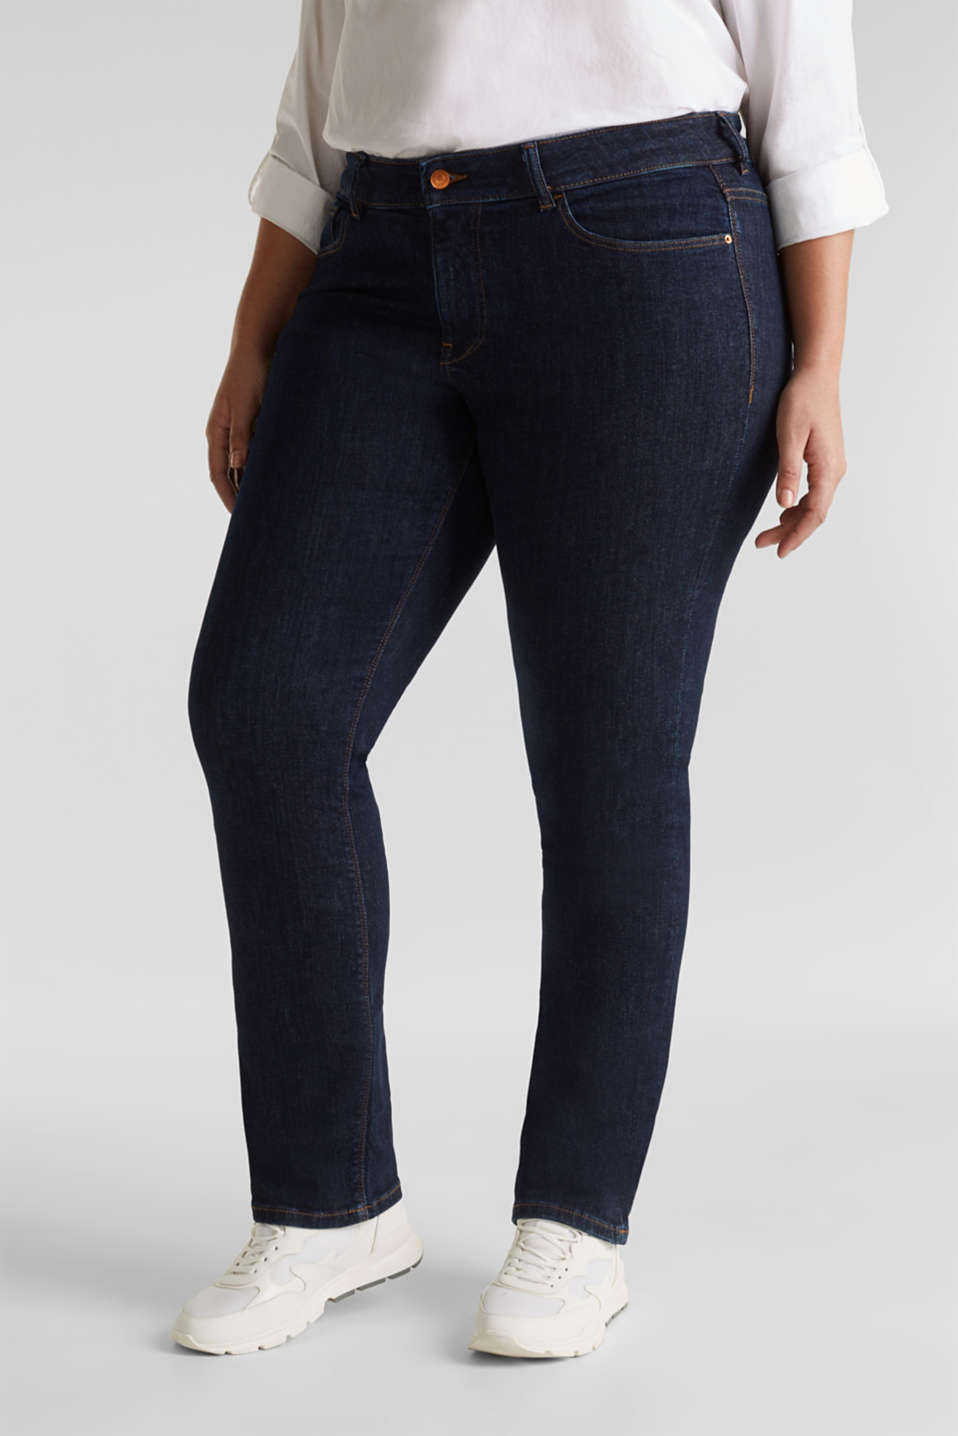 CURVY Basic-Jeans mit Stretchkomfort, BLUE RINSE, detail image number 6